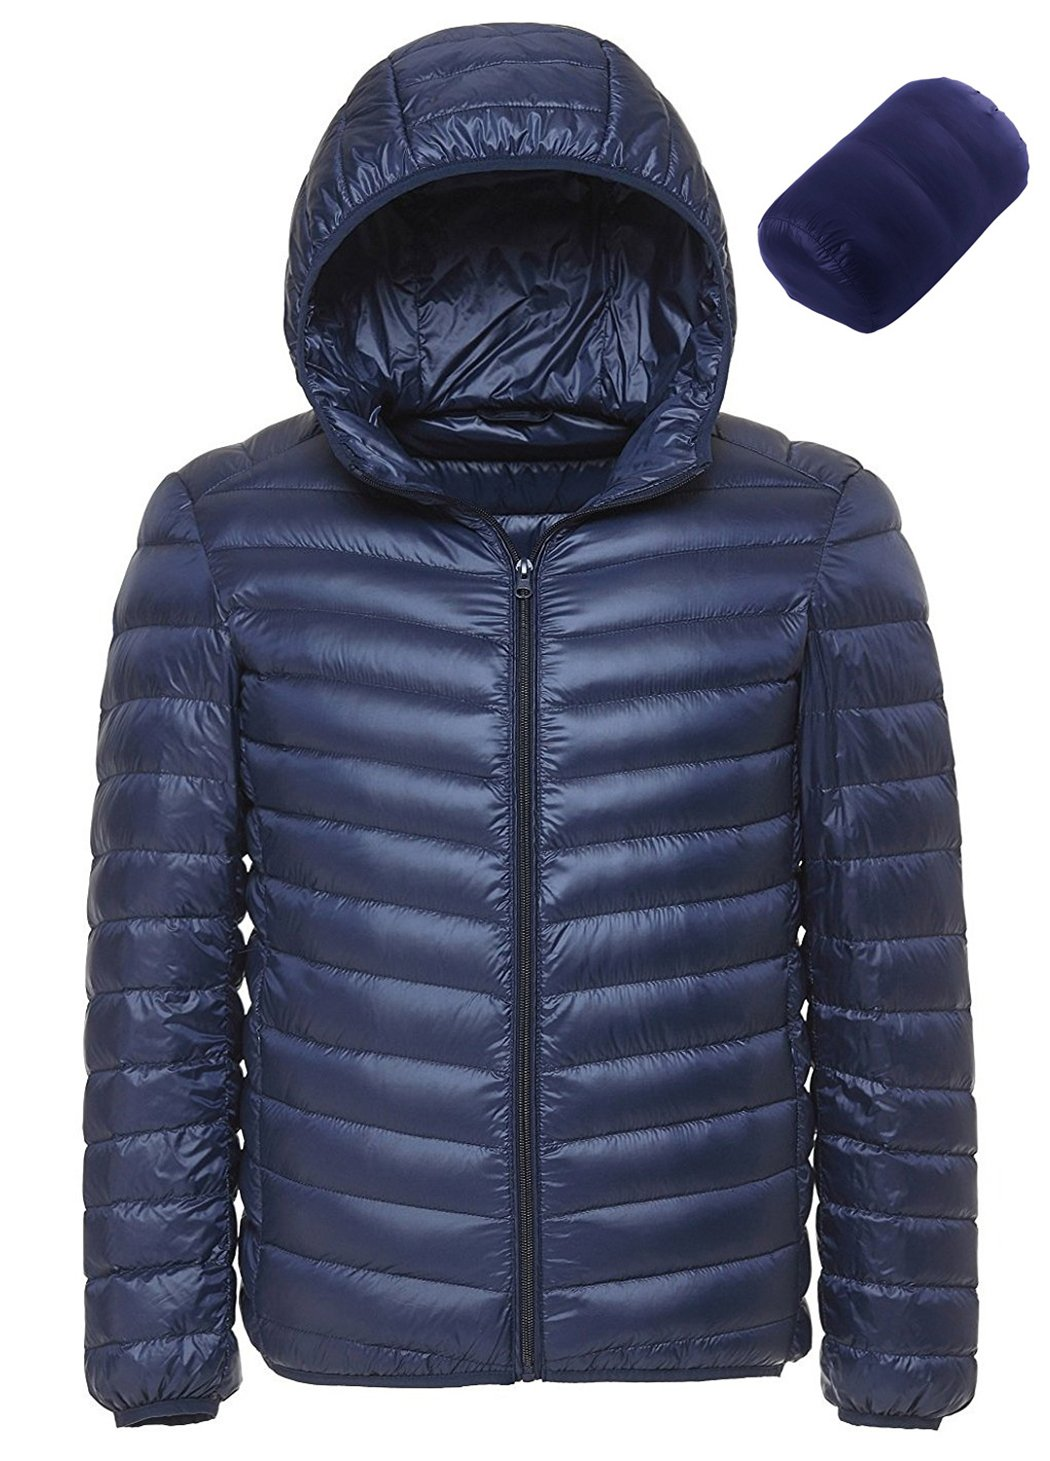 Sawadikaa Men's Winter Hooded Packable Ultra Light Pillow Down Puffer Jacket Coat Outdoor Quilted Lightweight Down Parka Navy Small